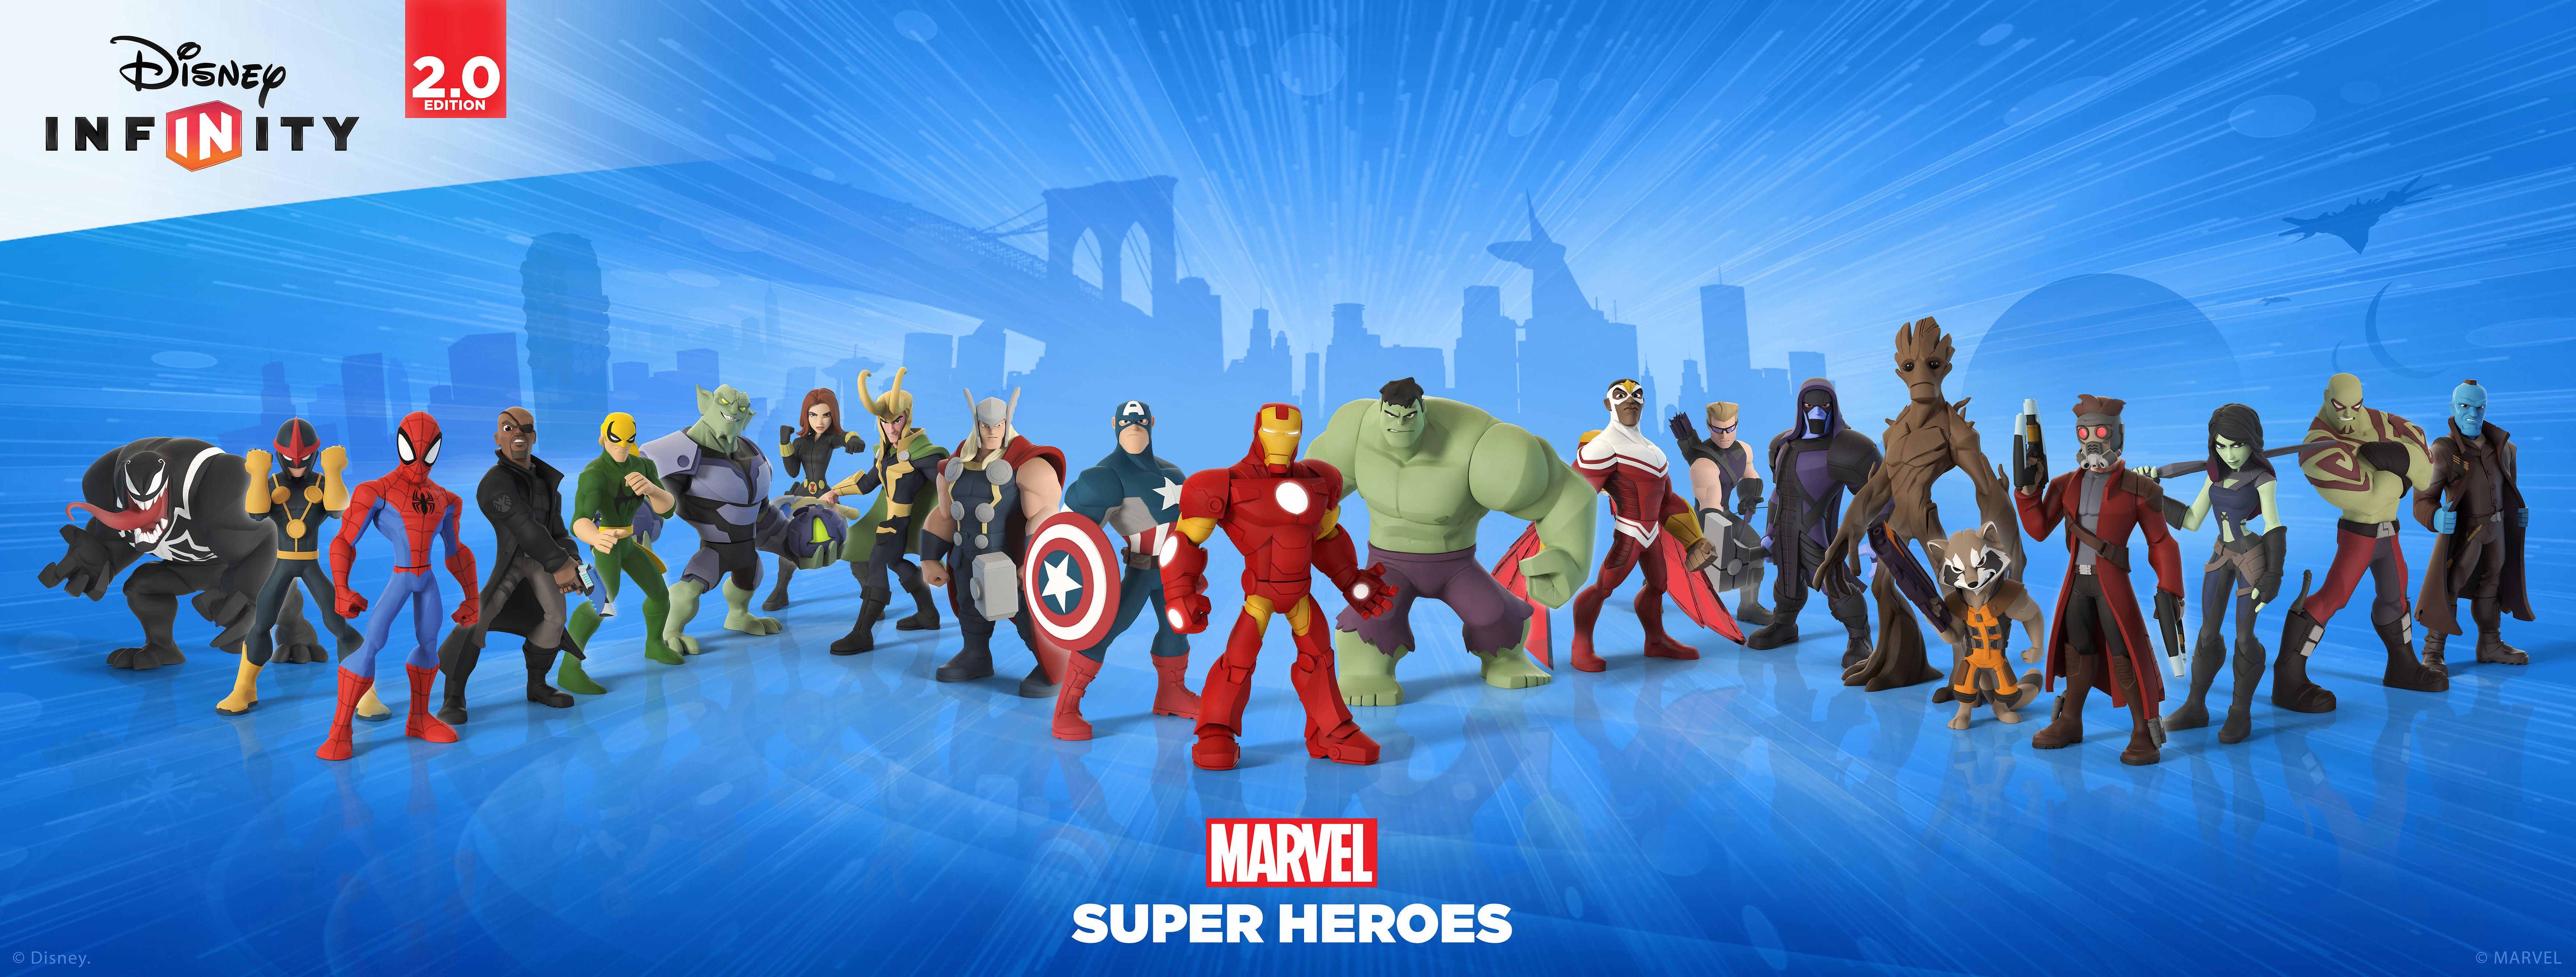 Injustice Starter Pack Characters Glo Lineup Avg Spd Gog Vilains Seb %b%d